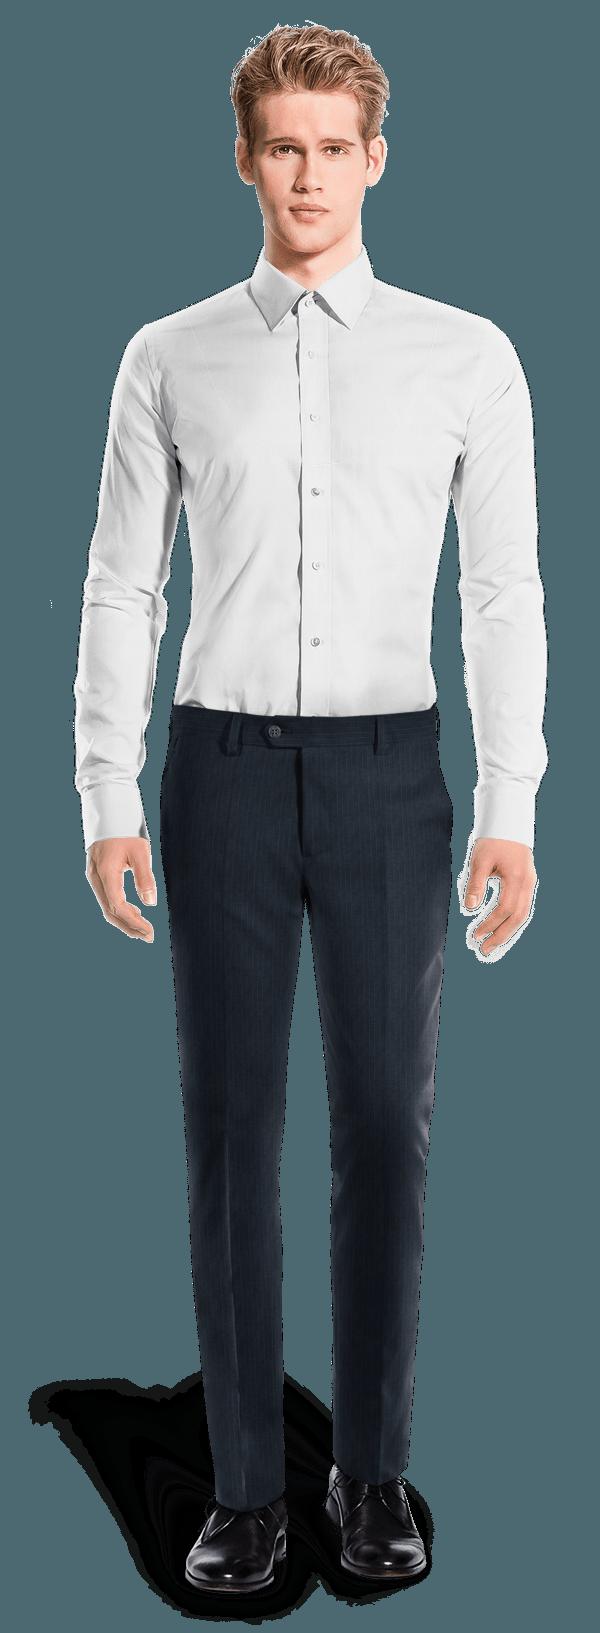 Pantaloni blu gessati di Lana